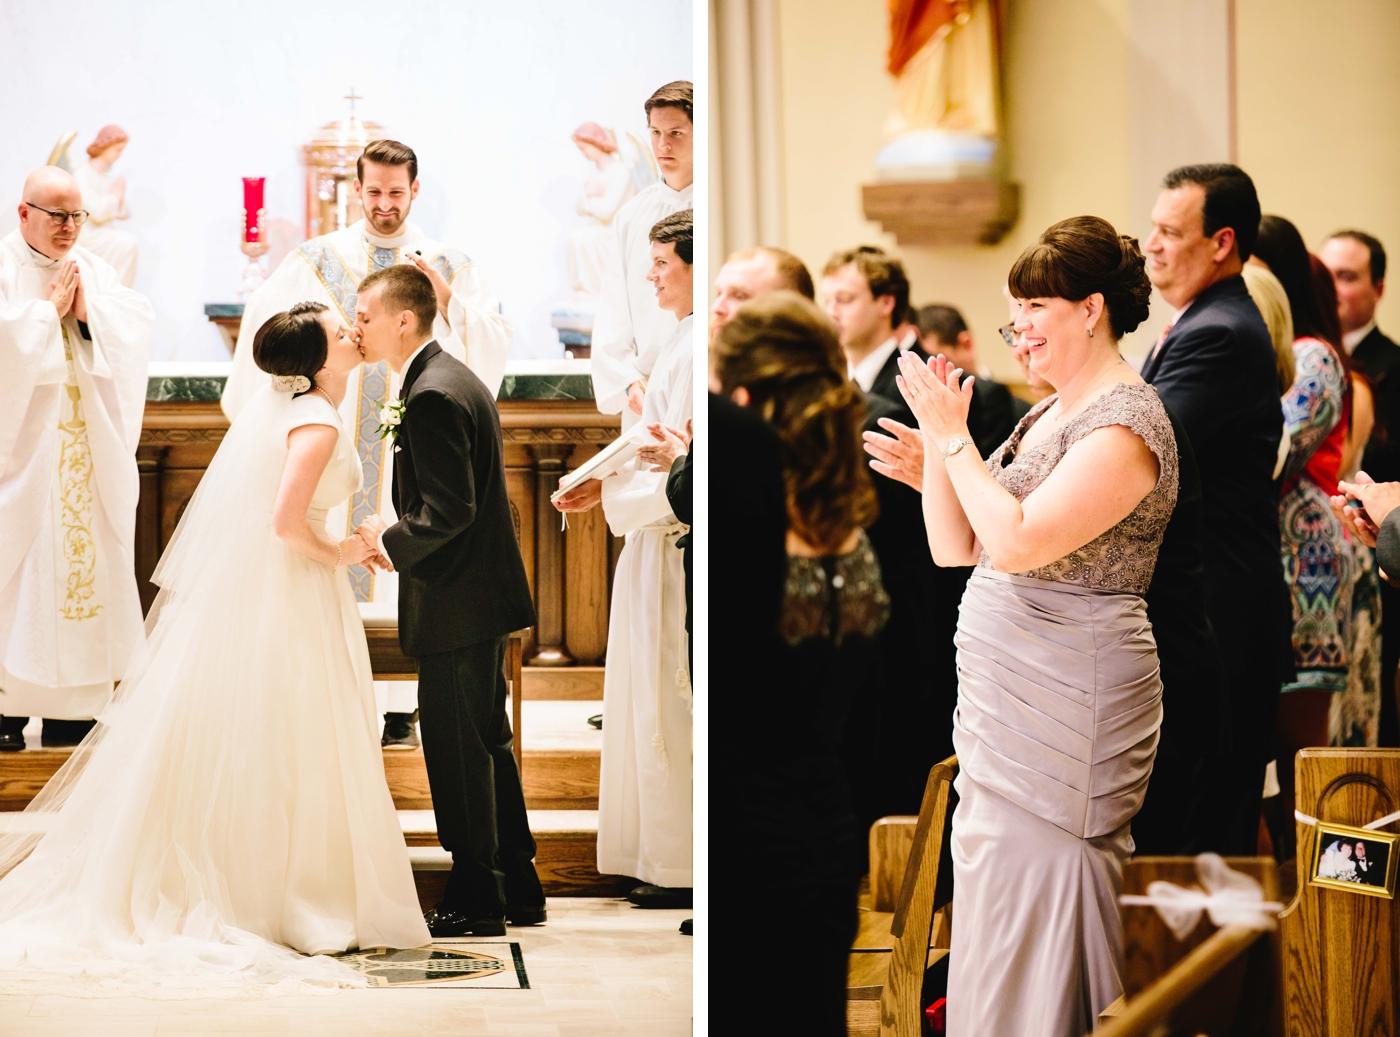 chicago-fine-art-wedding-photography-mccarthy53